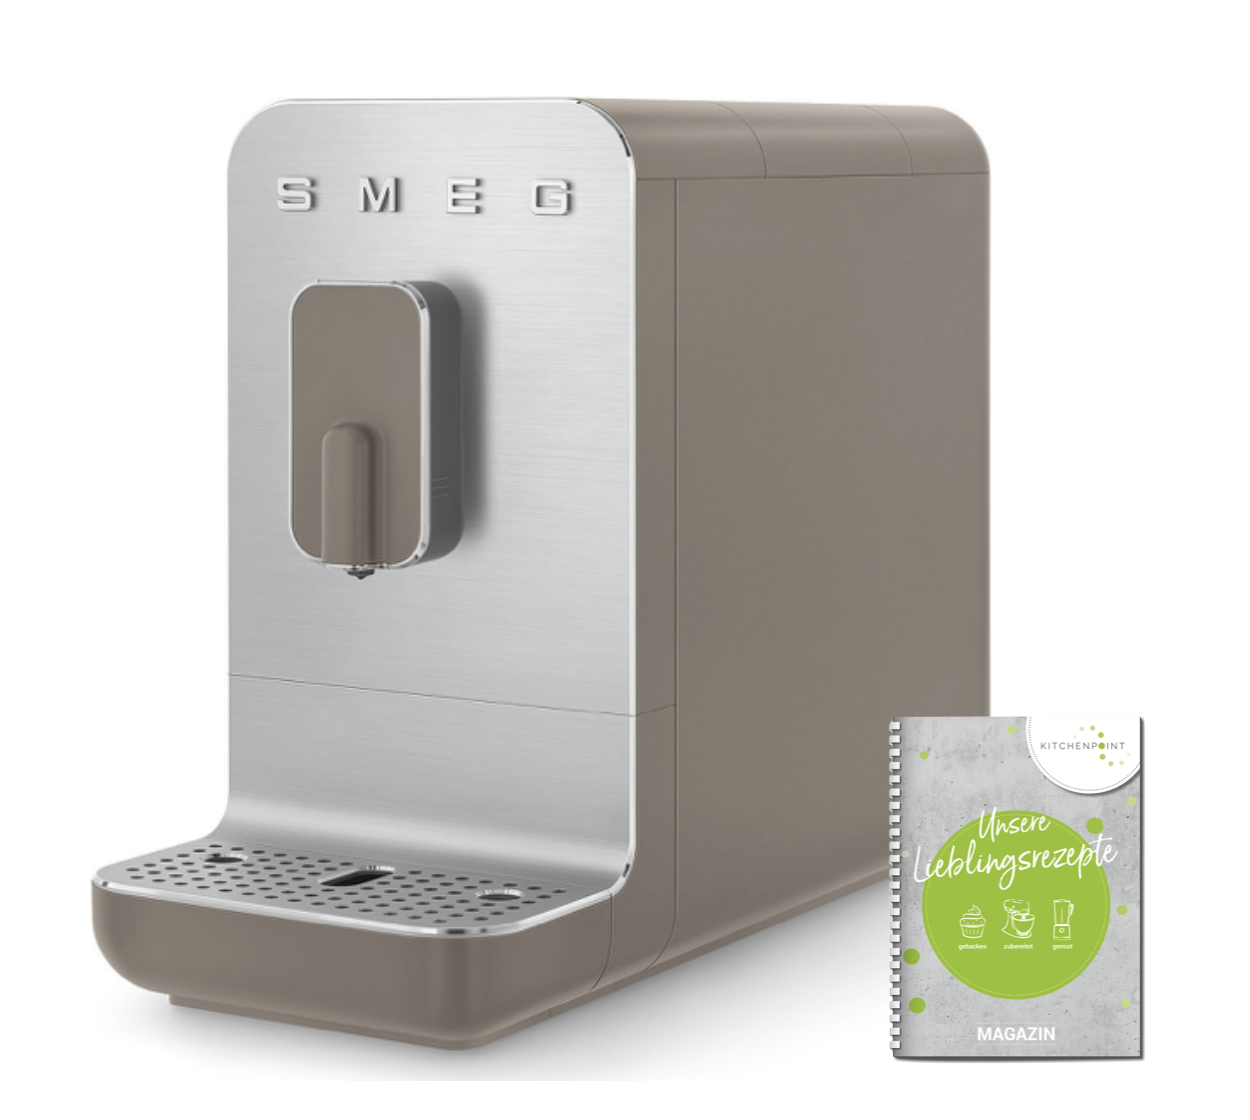 Smeg Kaffeevollautomat B001 Matt taupe